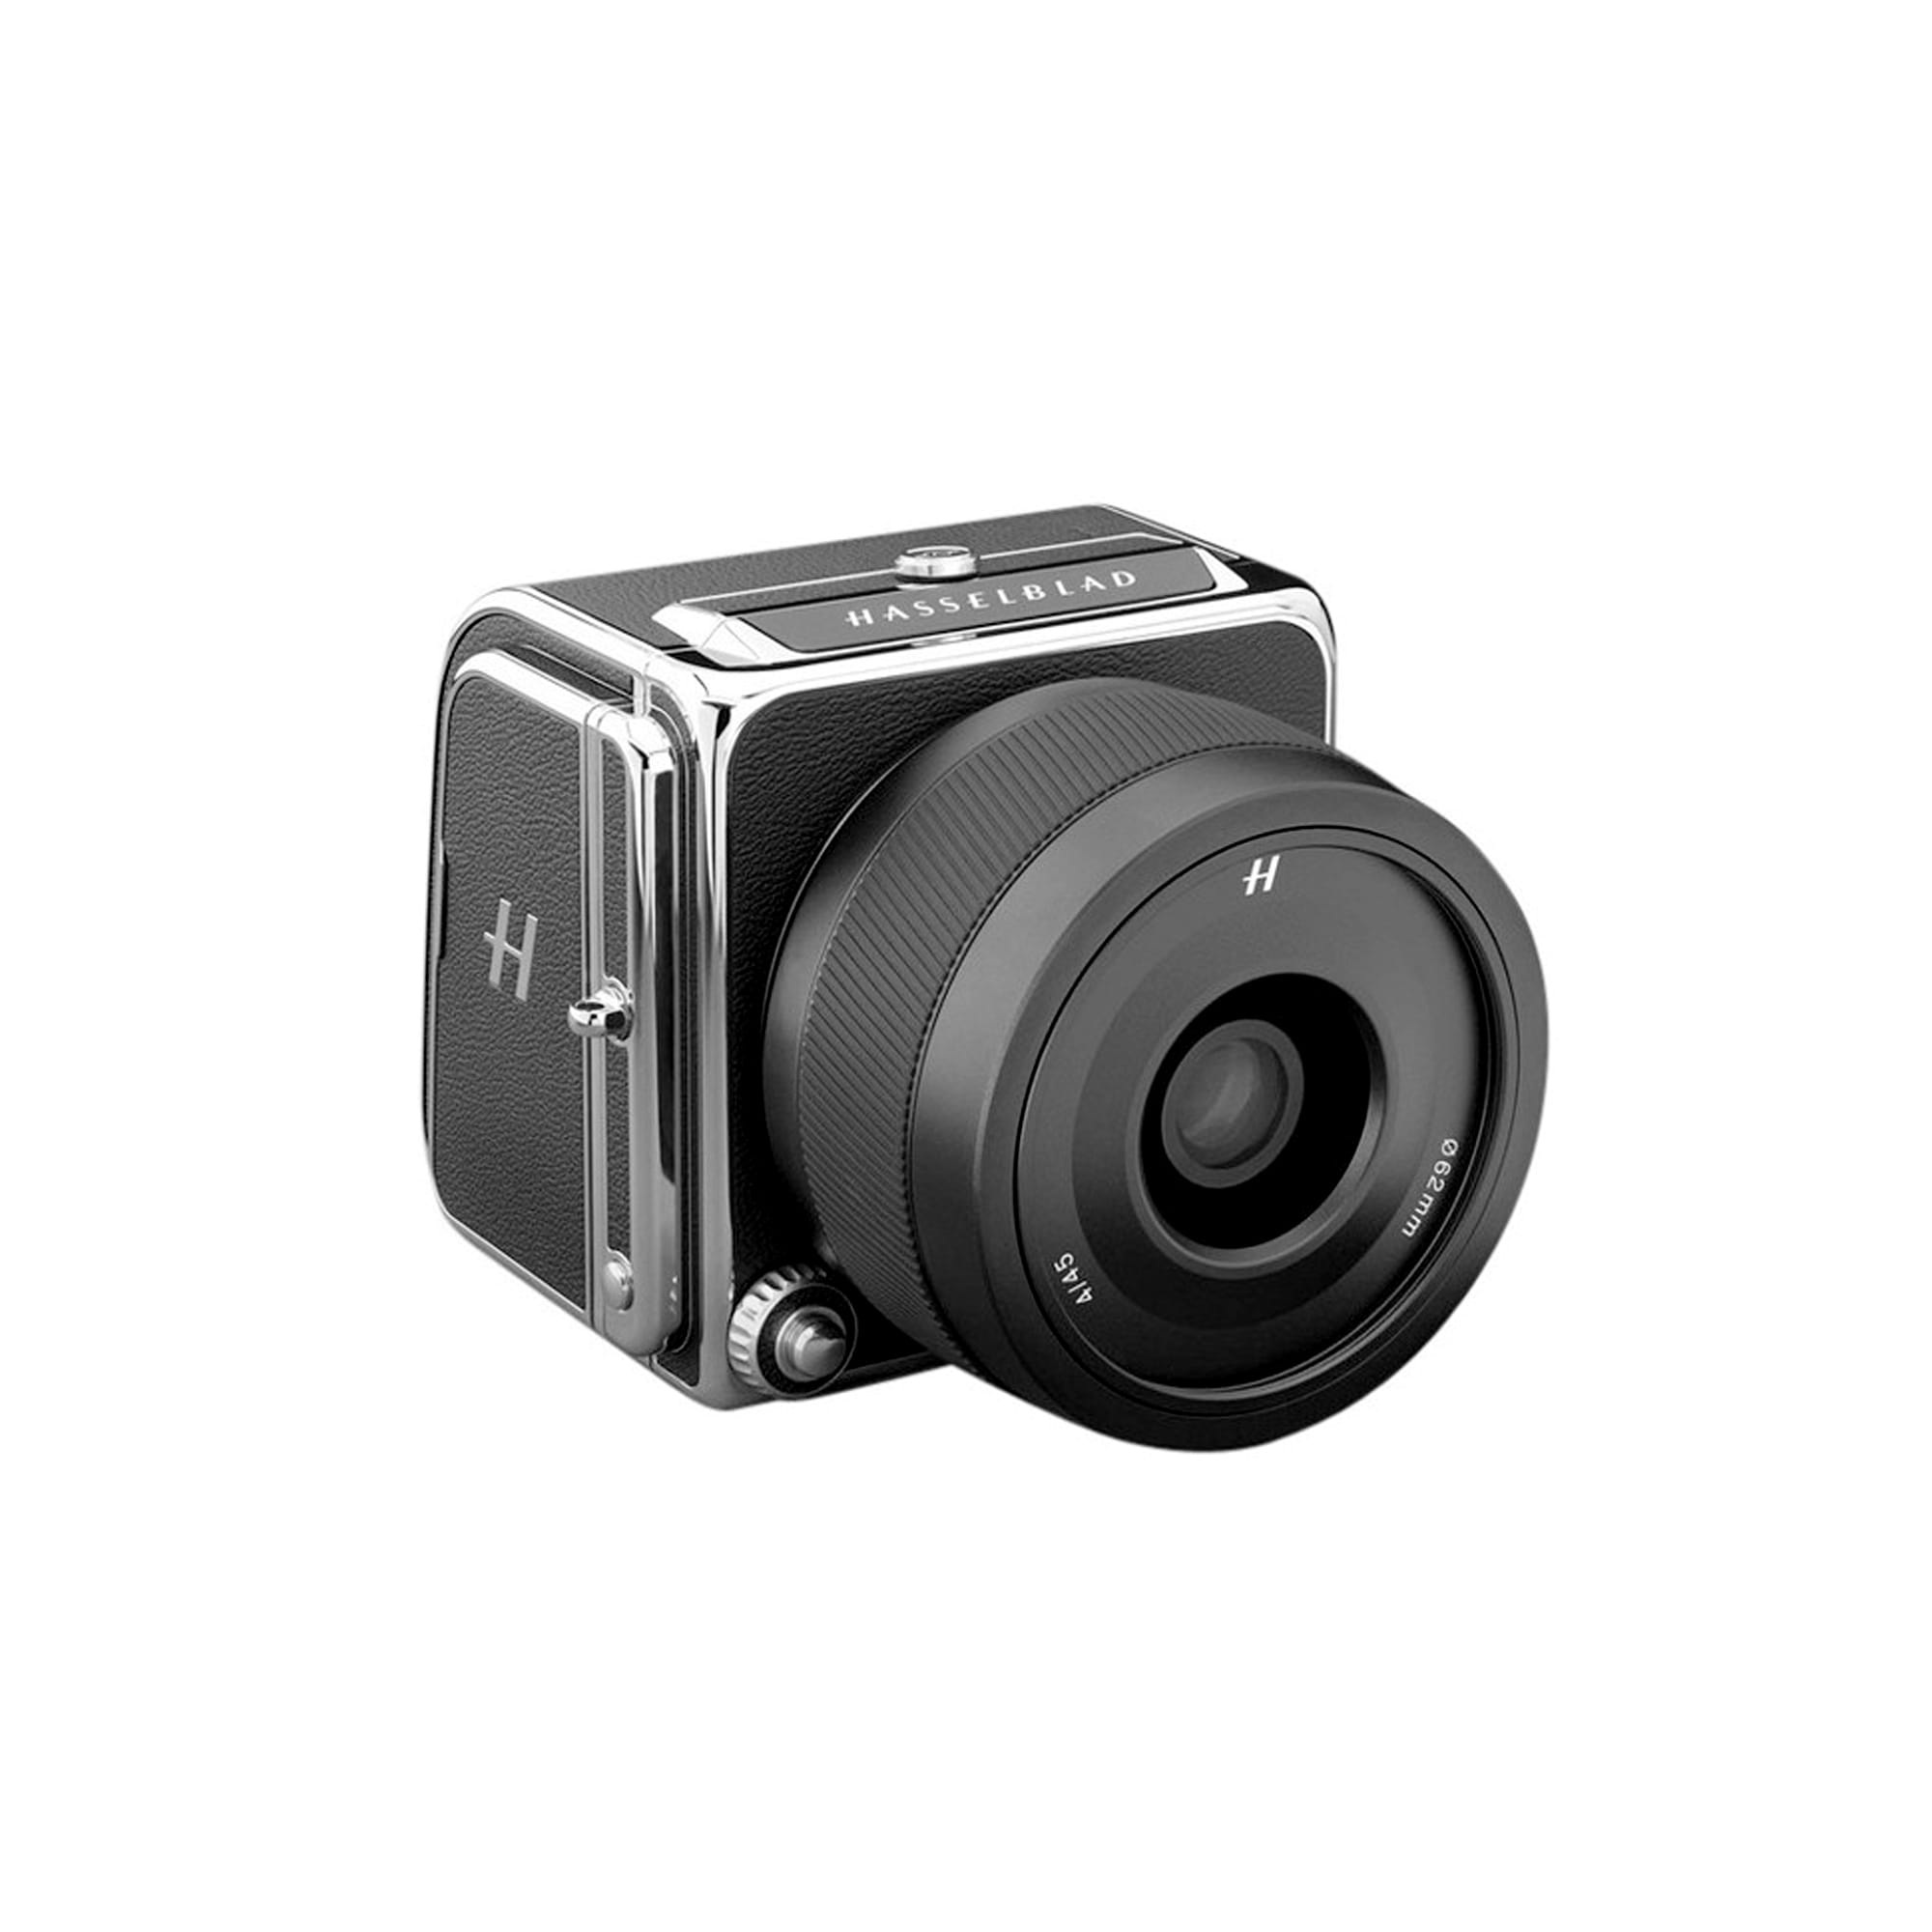 Hasselblad 907x 50C + XCD 45mm f/4.0 P